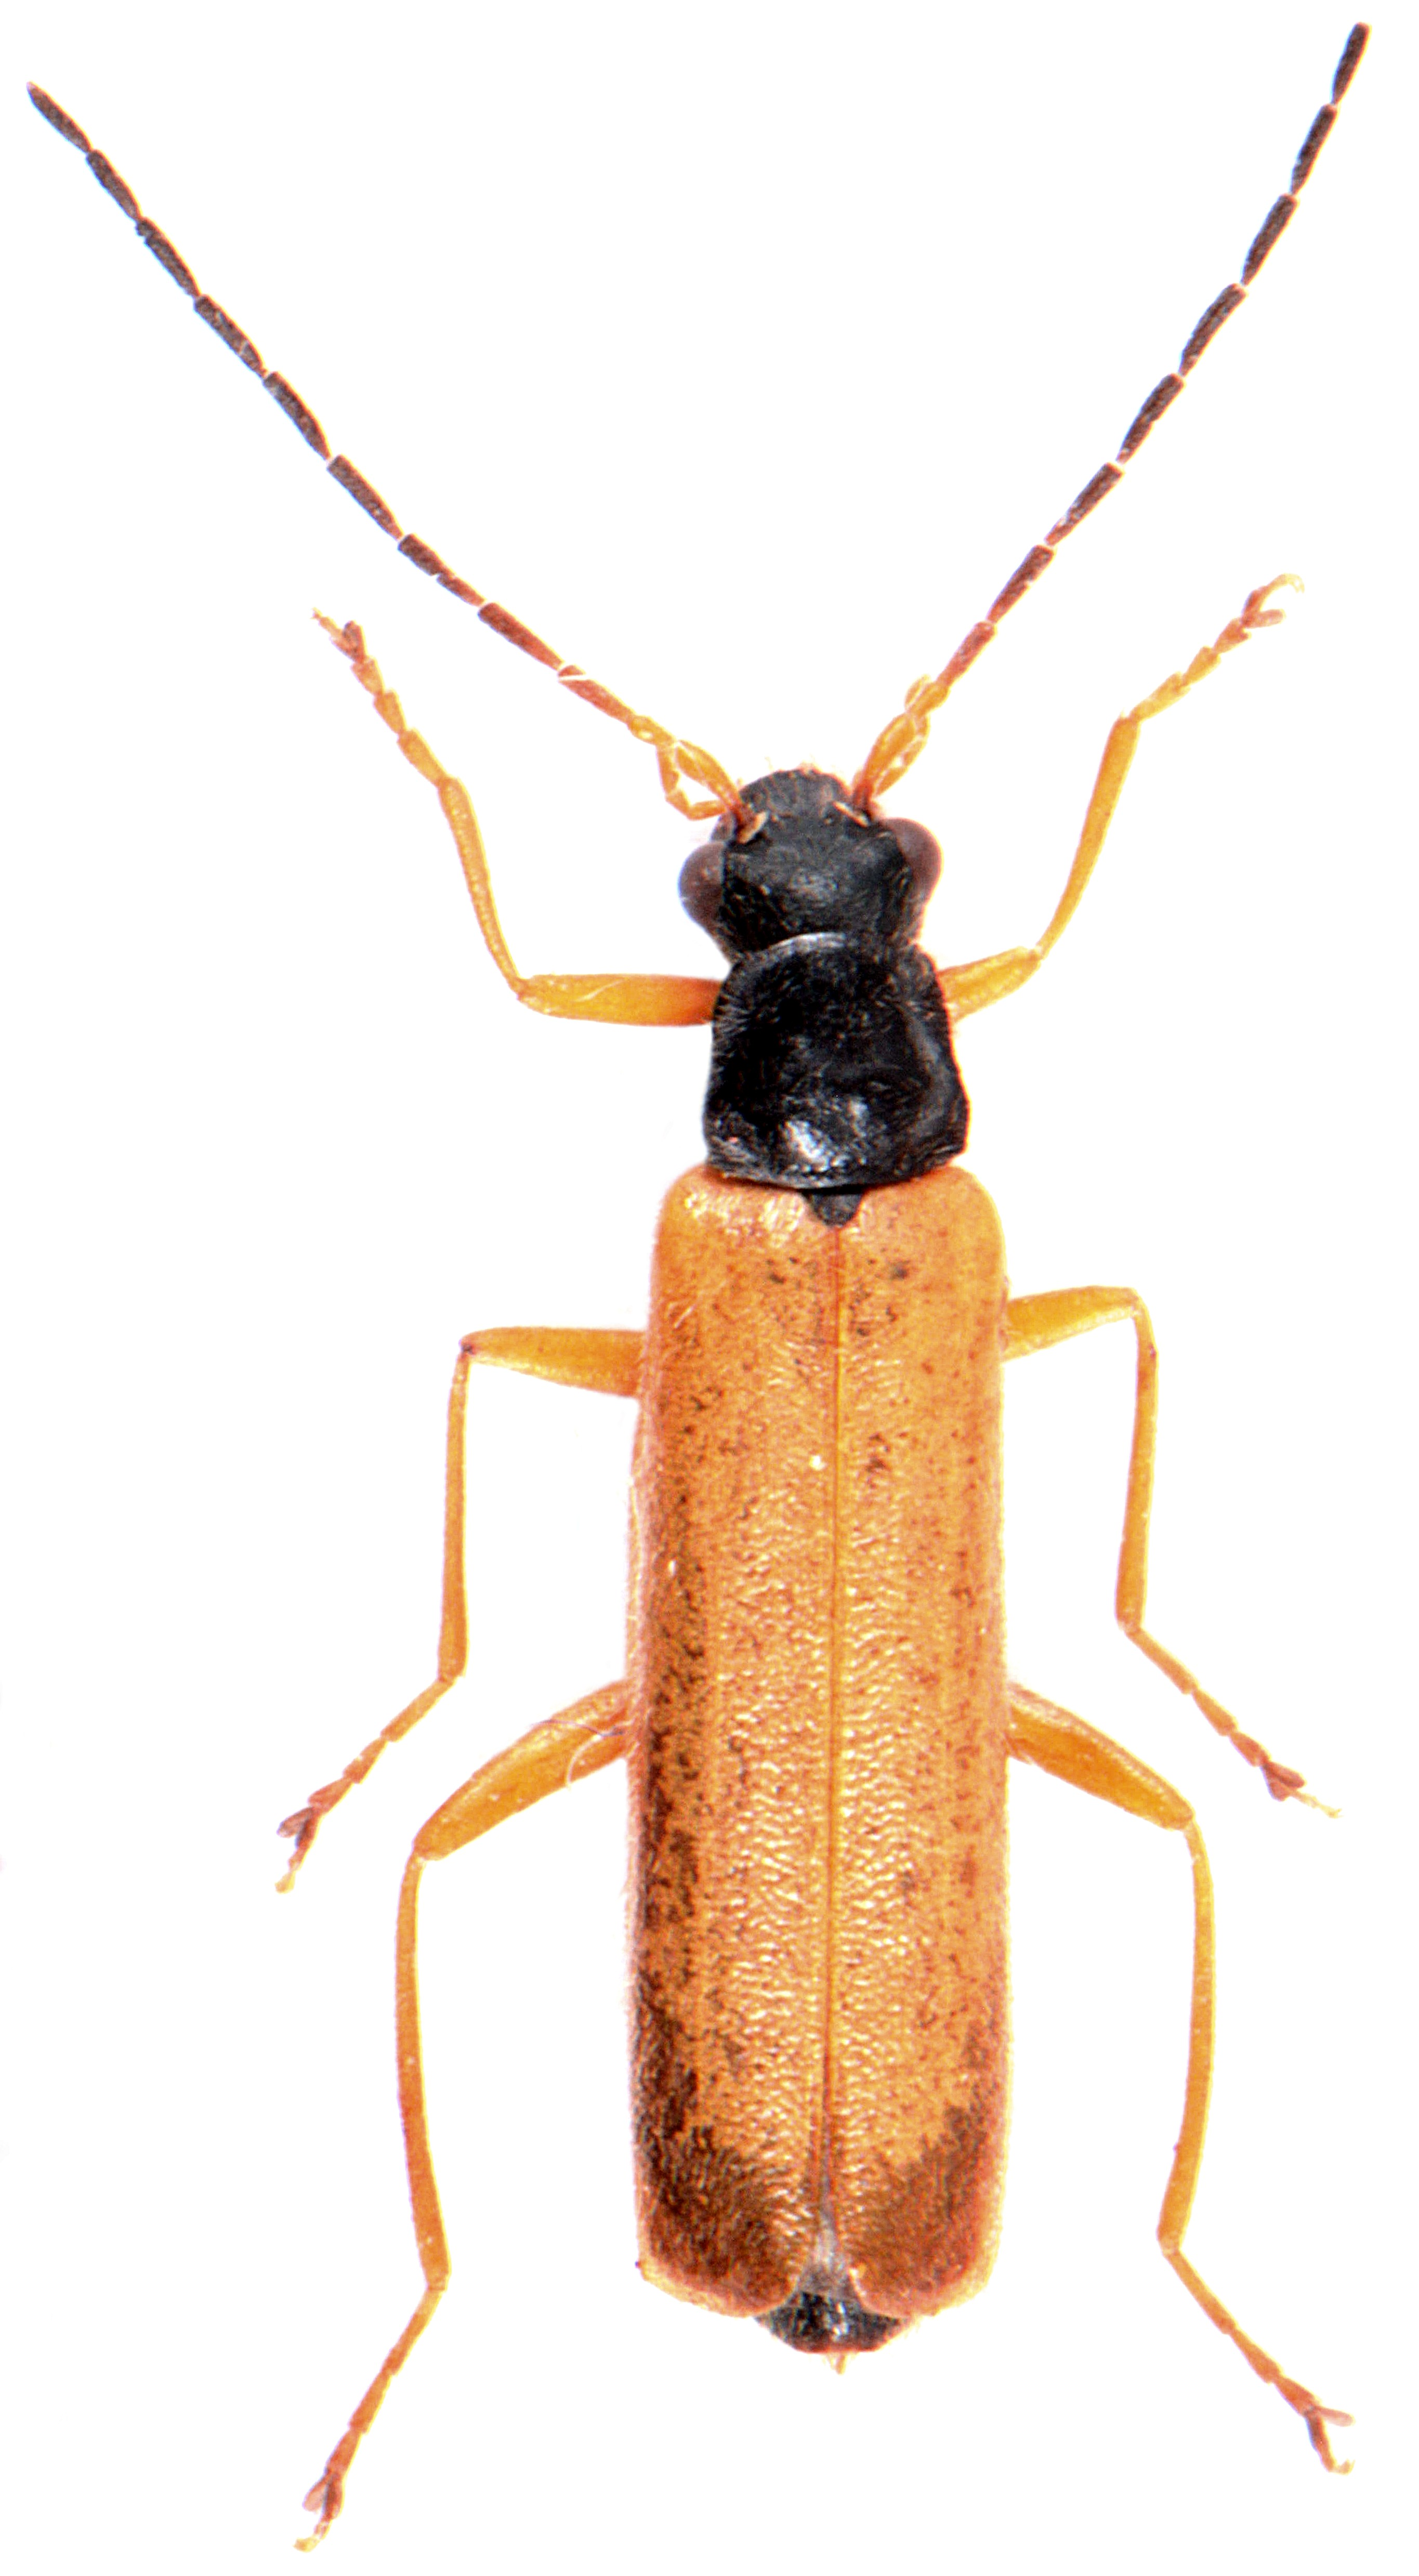 Rhagonycha lignosa